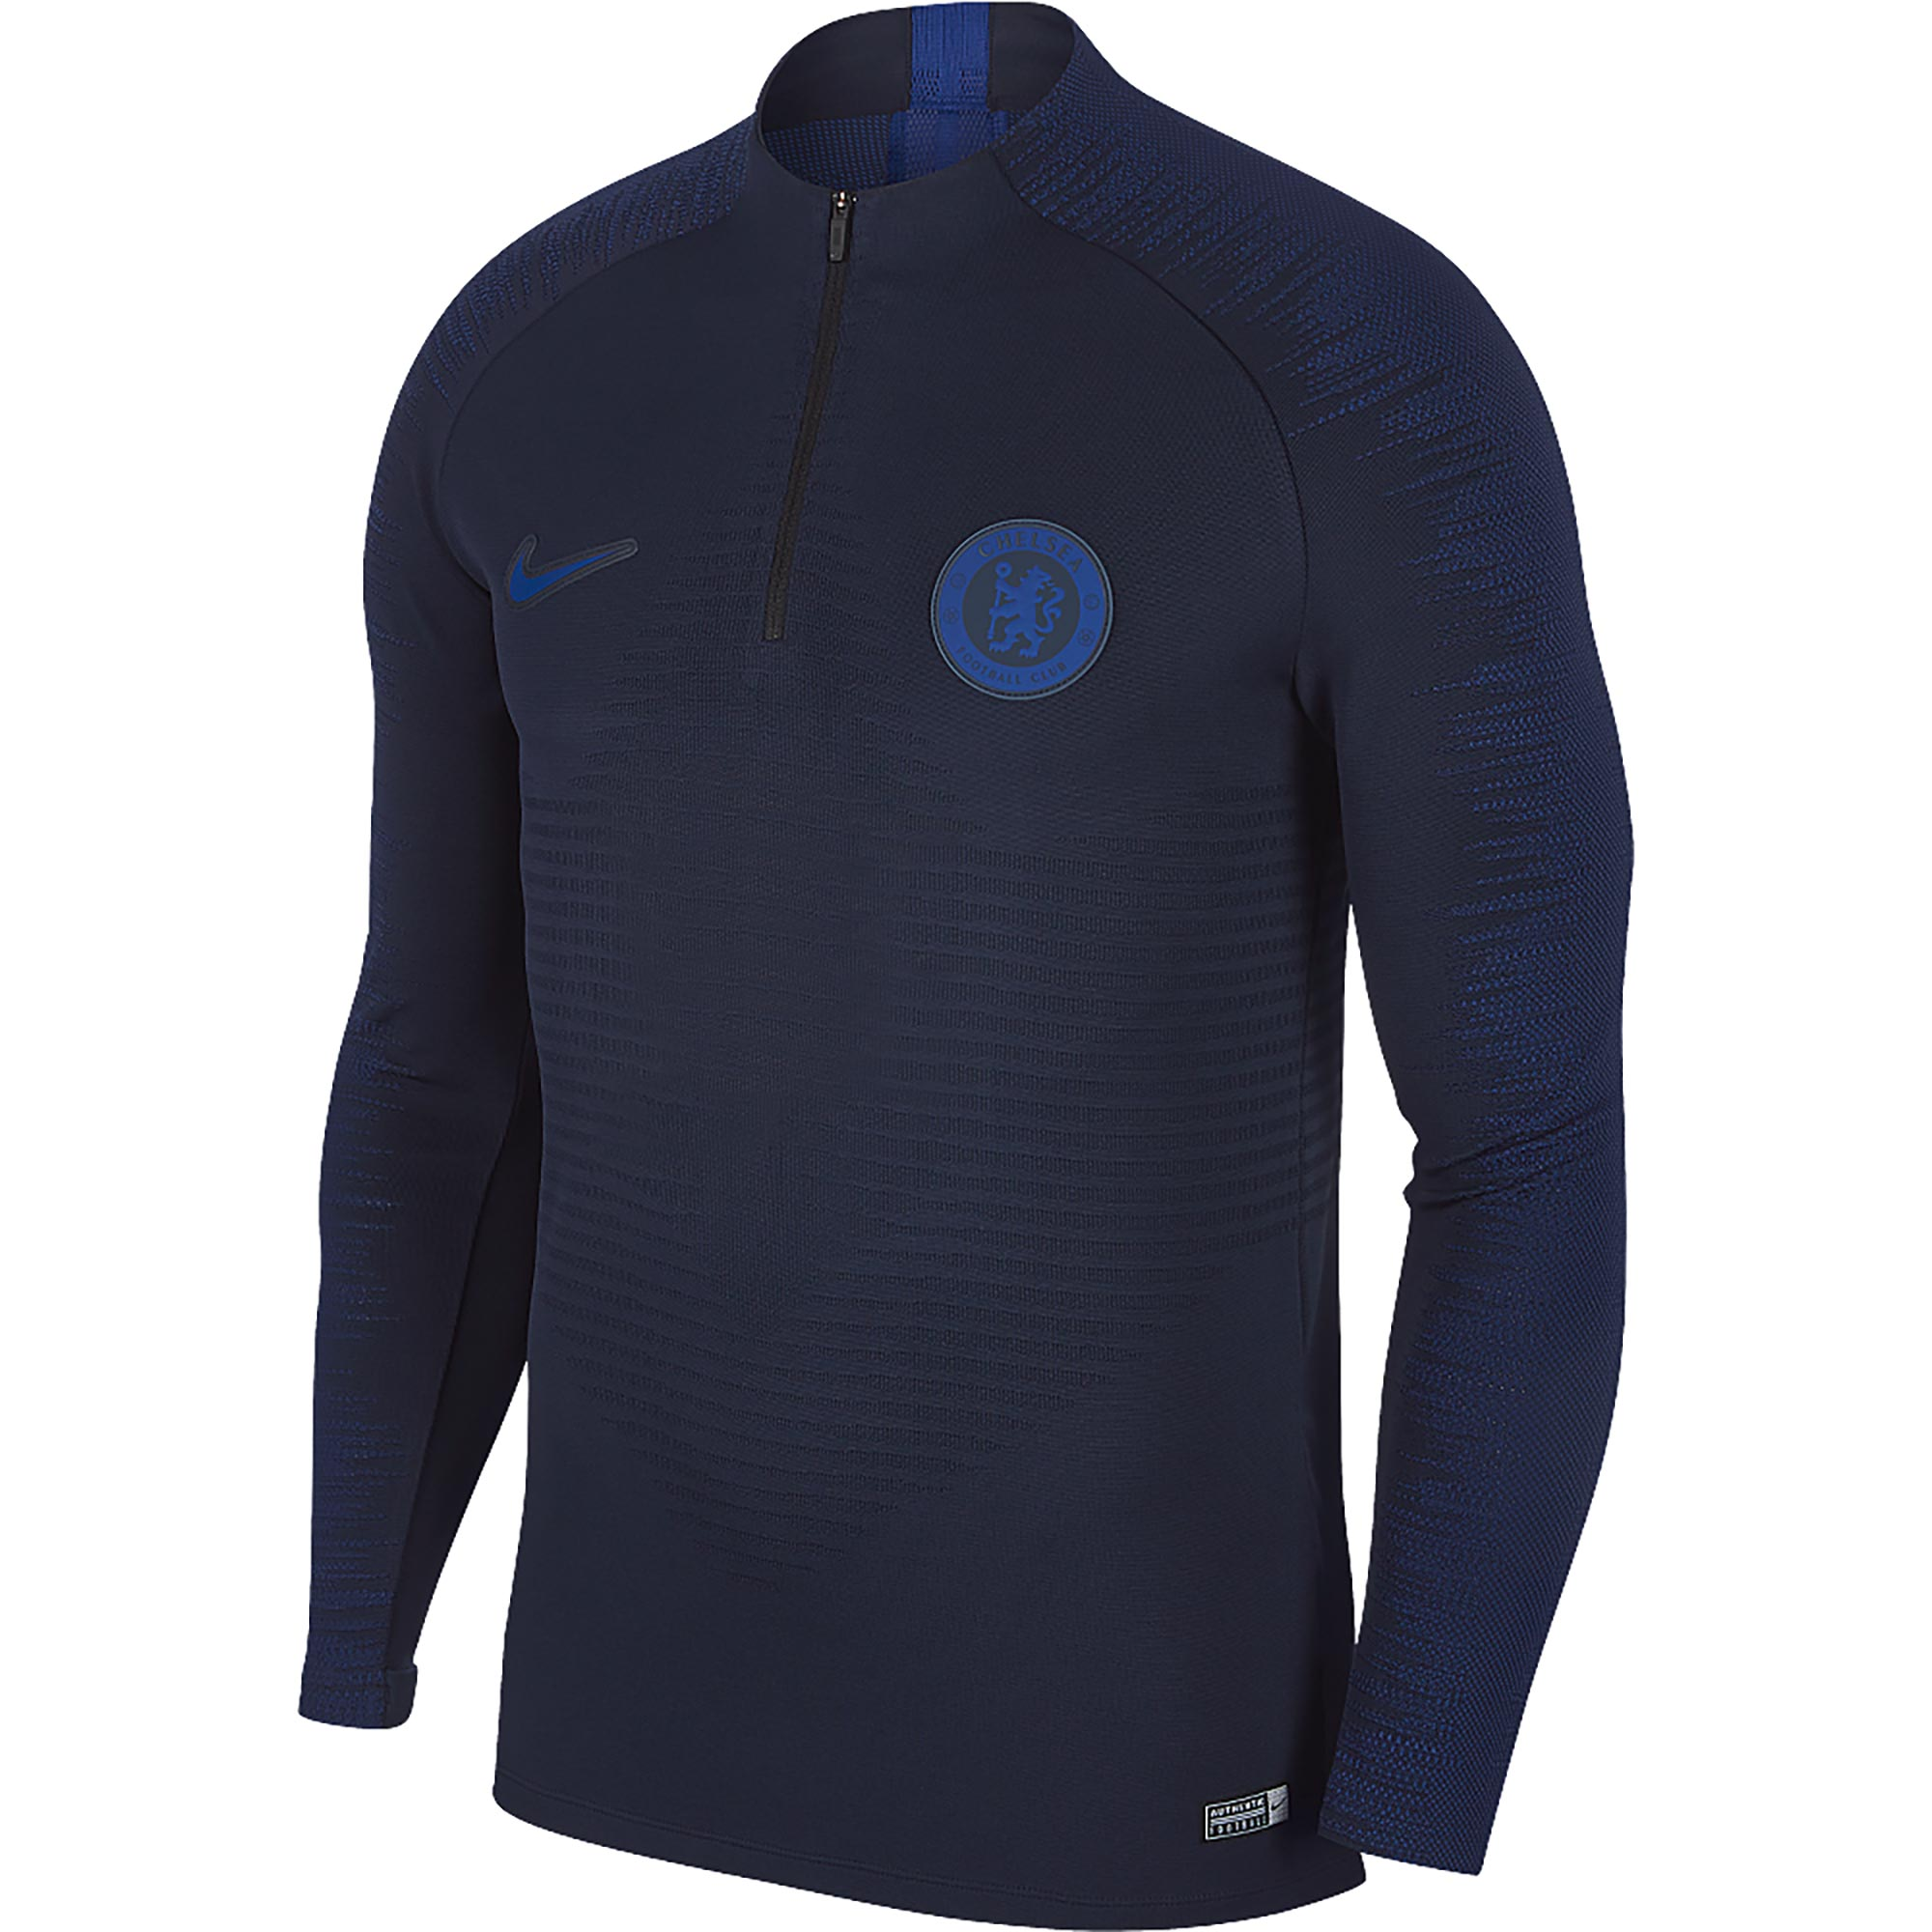 Nike / Camiseta Vaporknit Strike Drill del Chelsea en azul marino